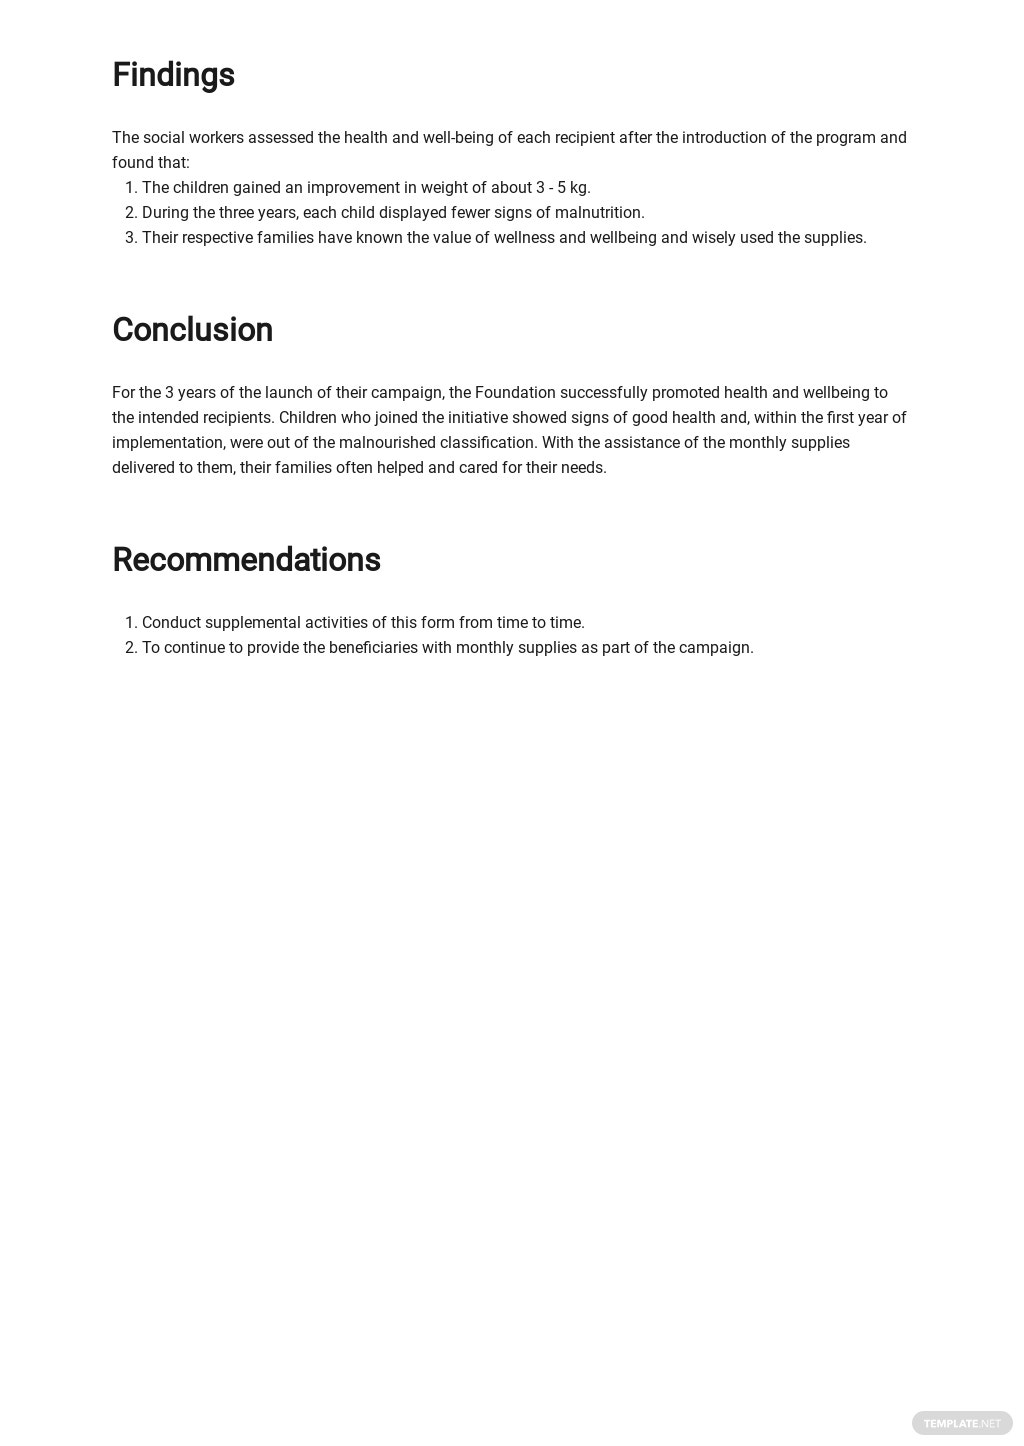 Test Result Evaluation Report Template 2.jpe